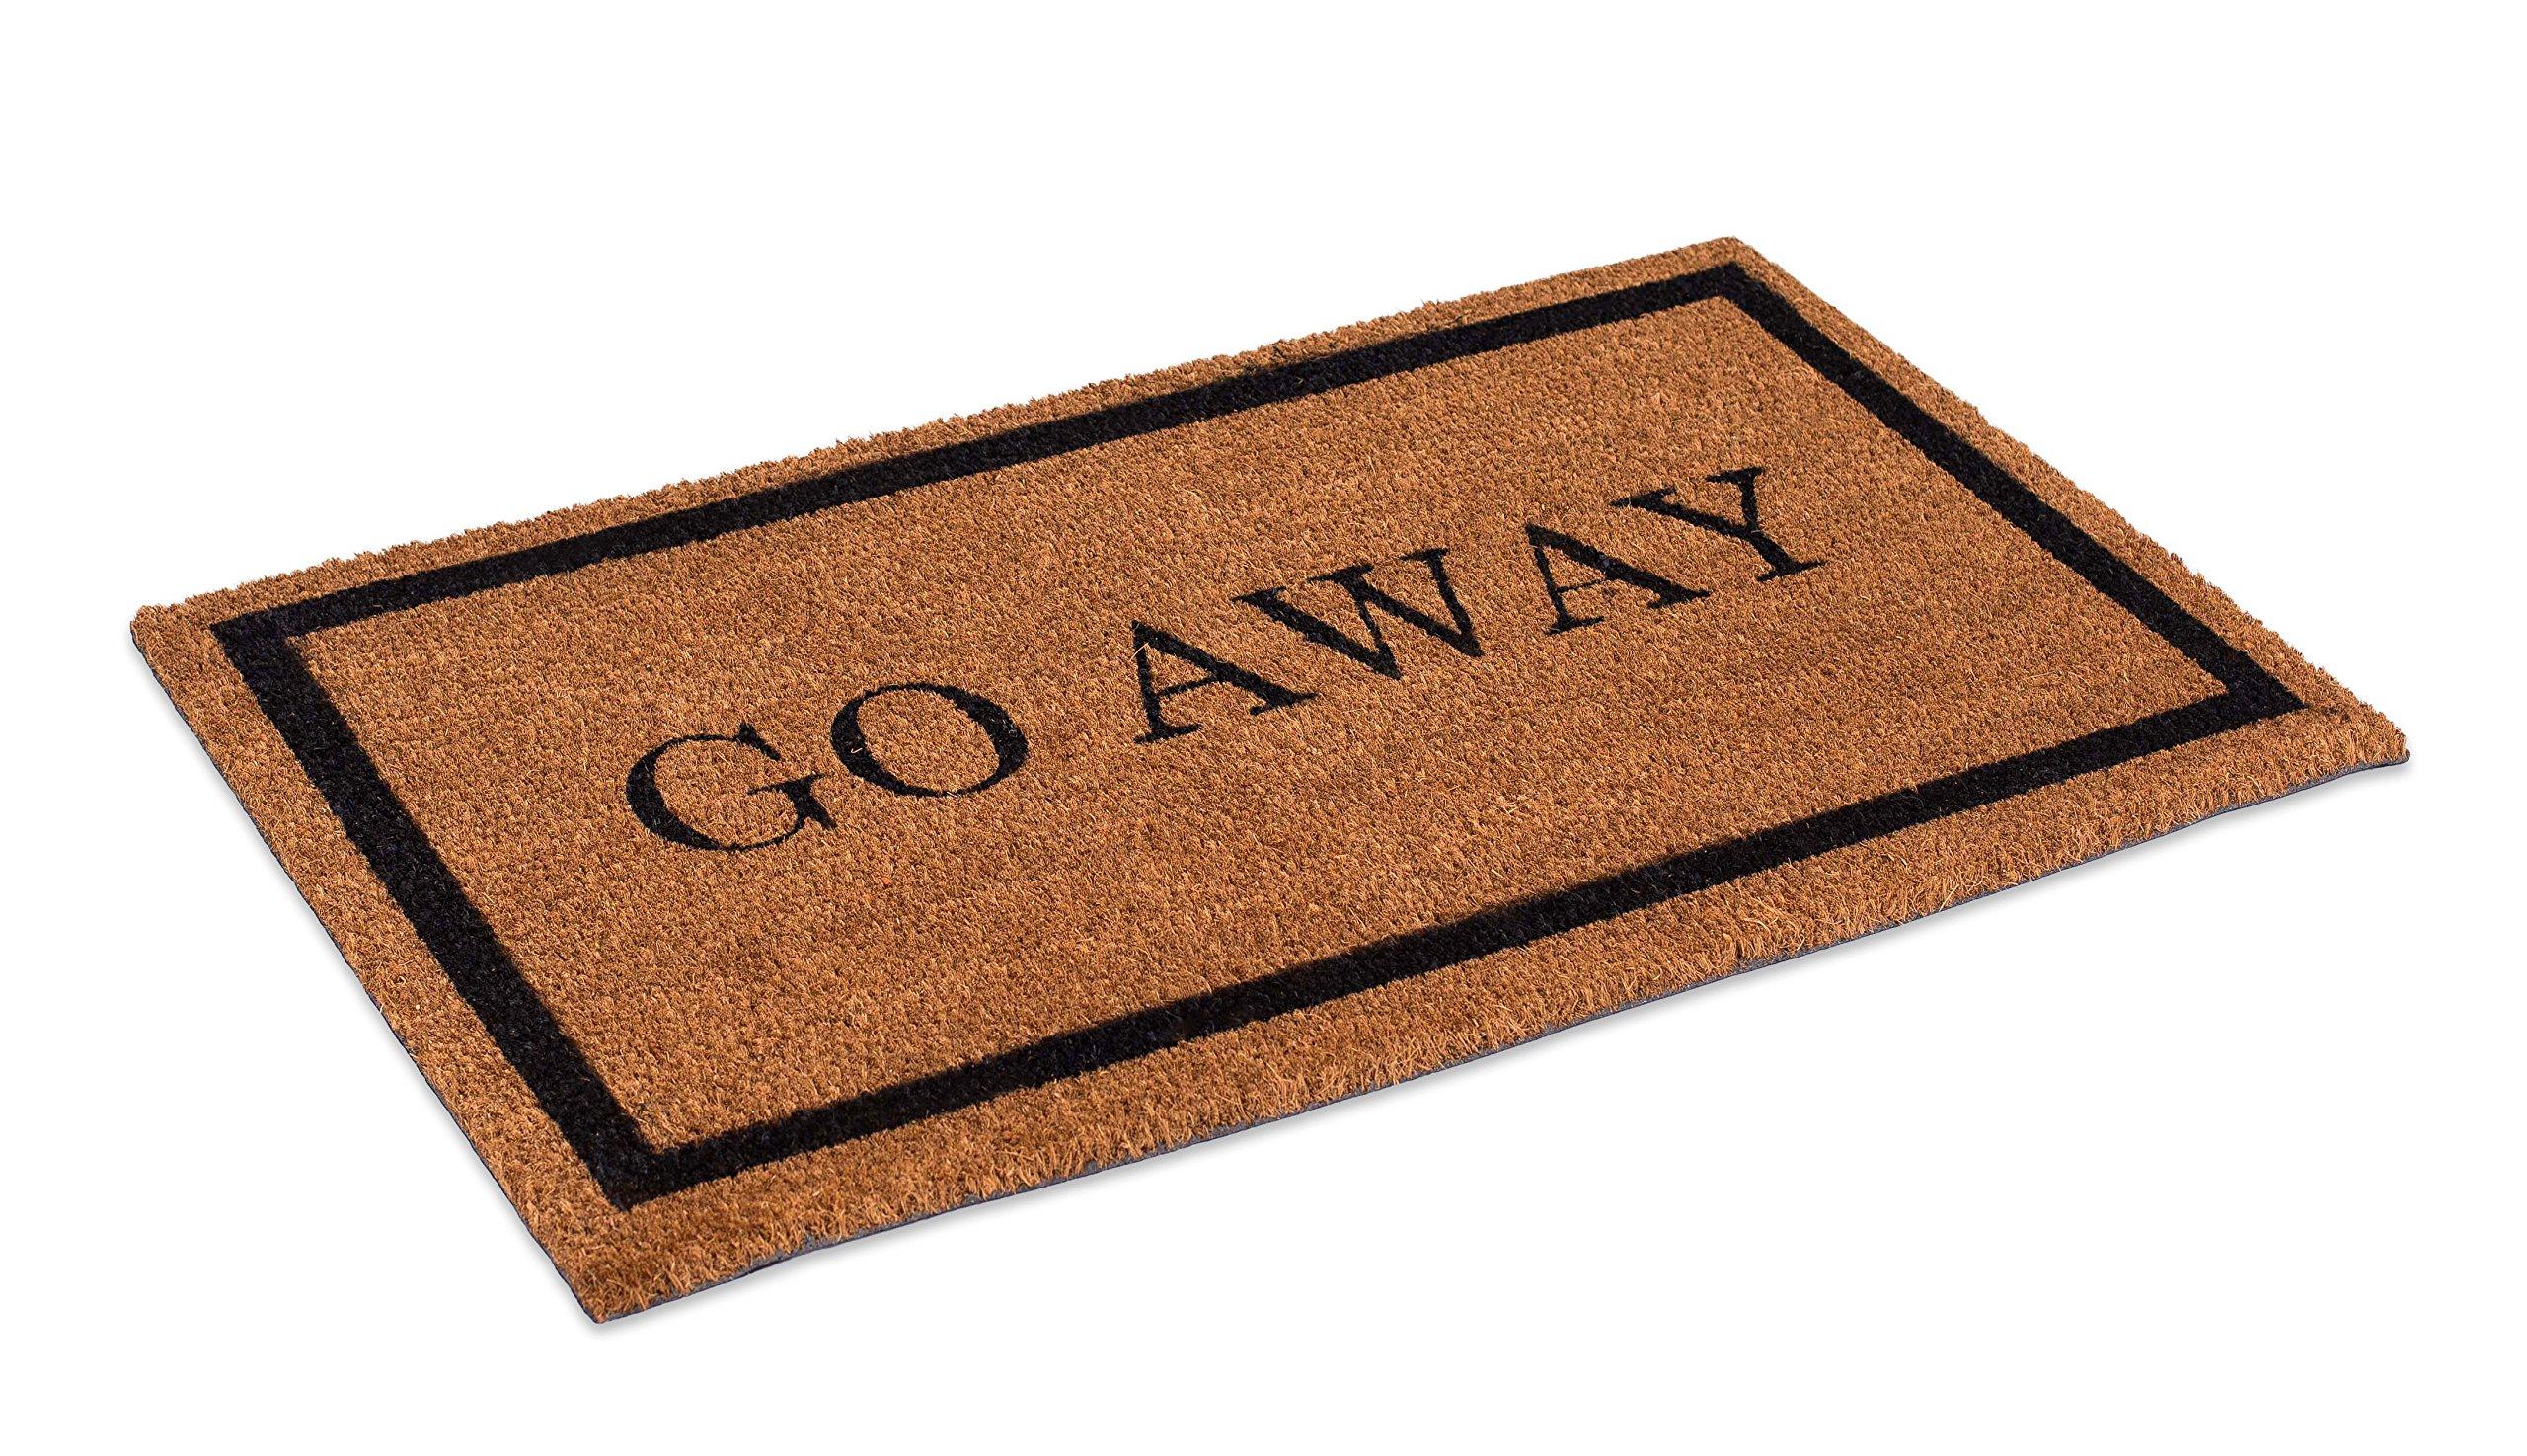 BirdRock Home Go Away Coir Doormat | 18 x 30 Inch | Standard Welcome Mat with Black Border and Natural Fade | Vinyl Backed | Outdoor